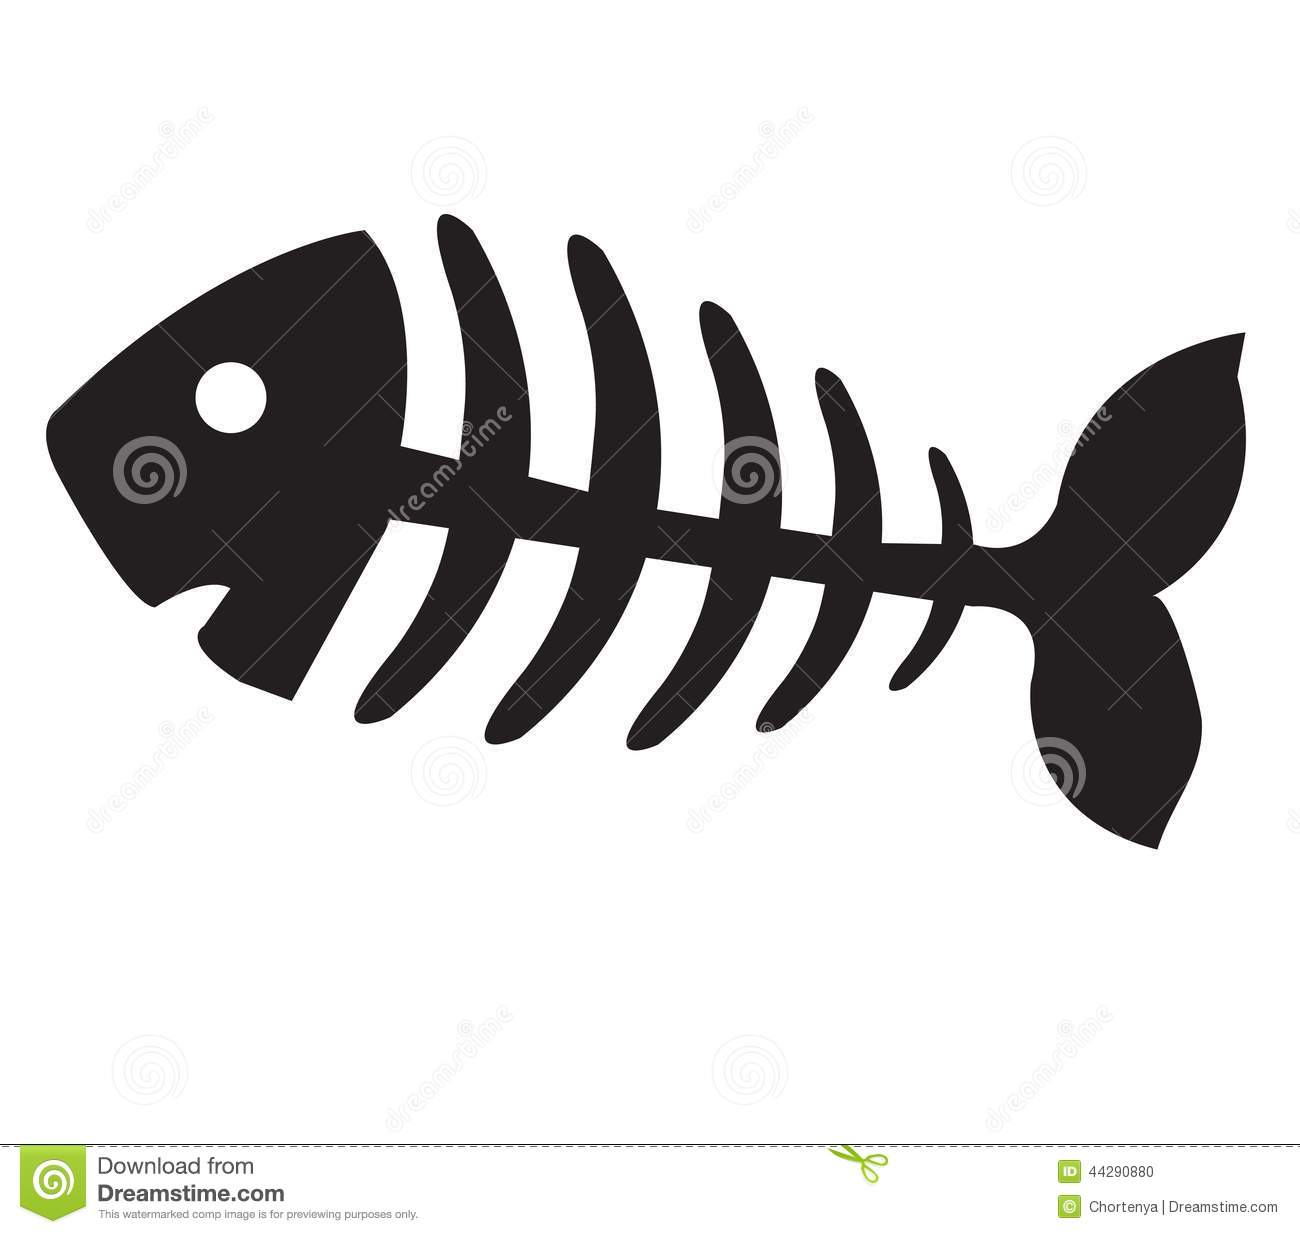 Bone fish clipart 7 » Clipart Station.